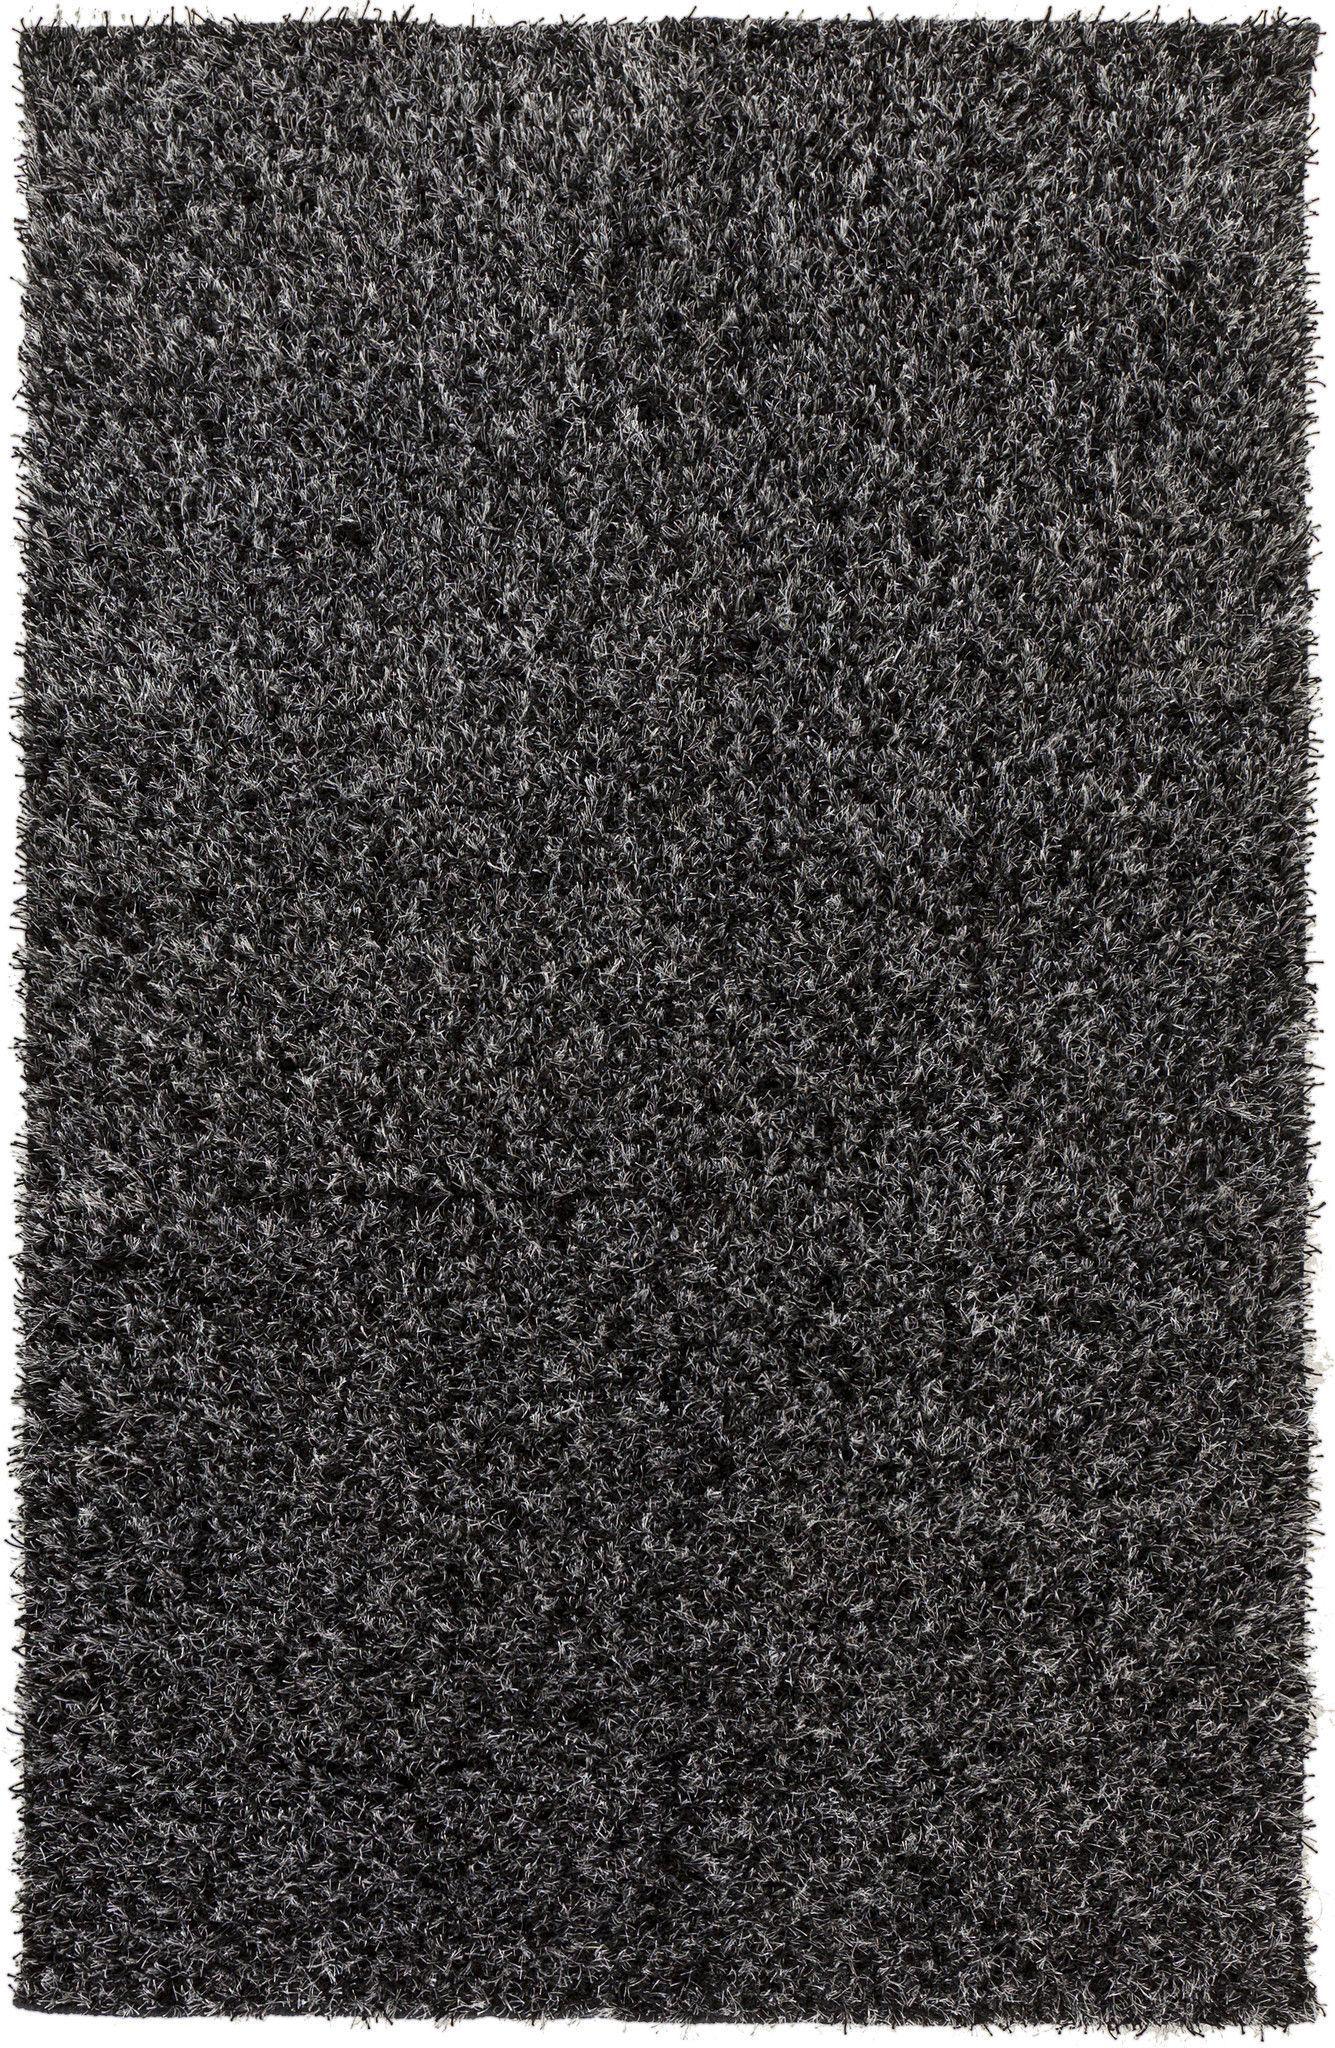 Surya Taz1020 Taz Gray Black Rectangle Area Rug